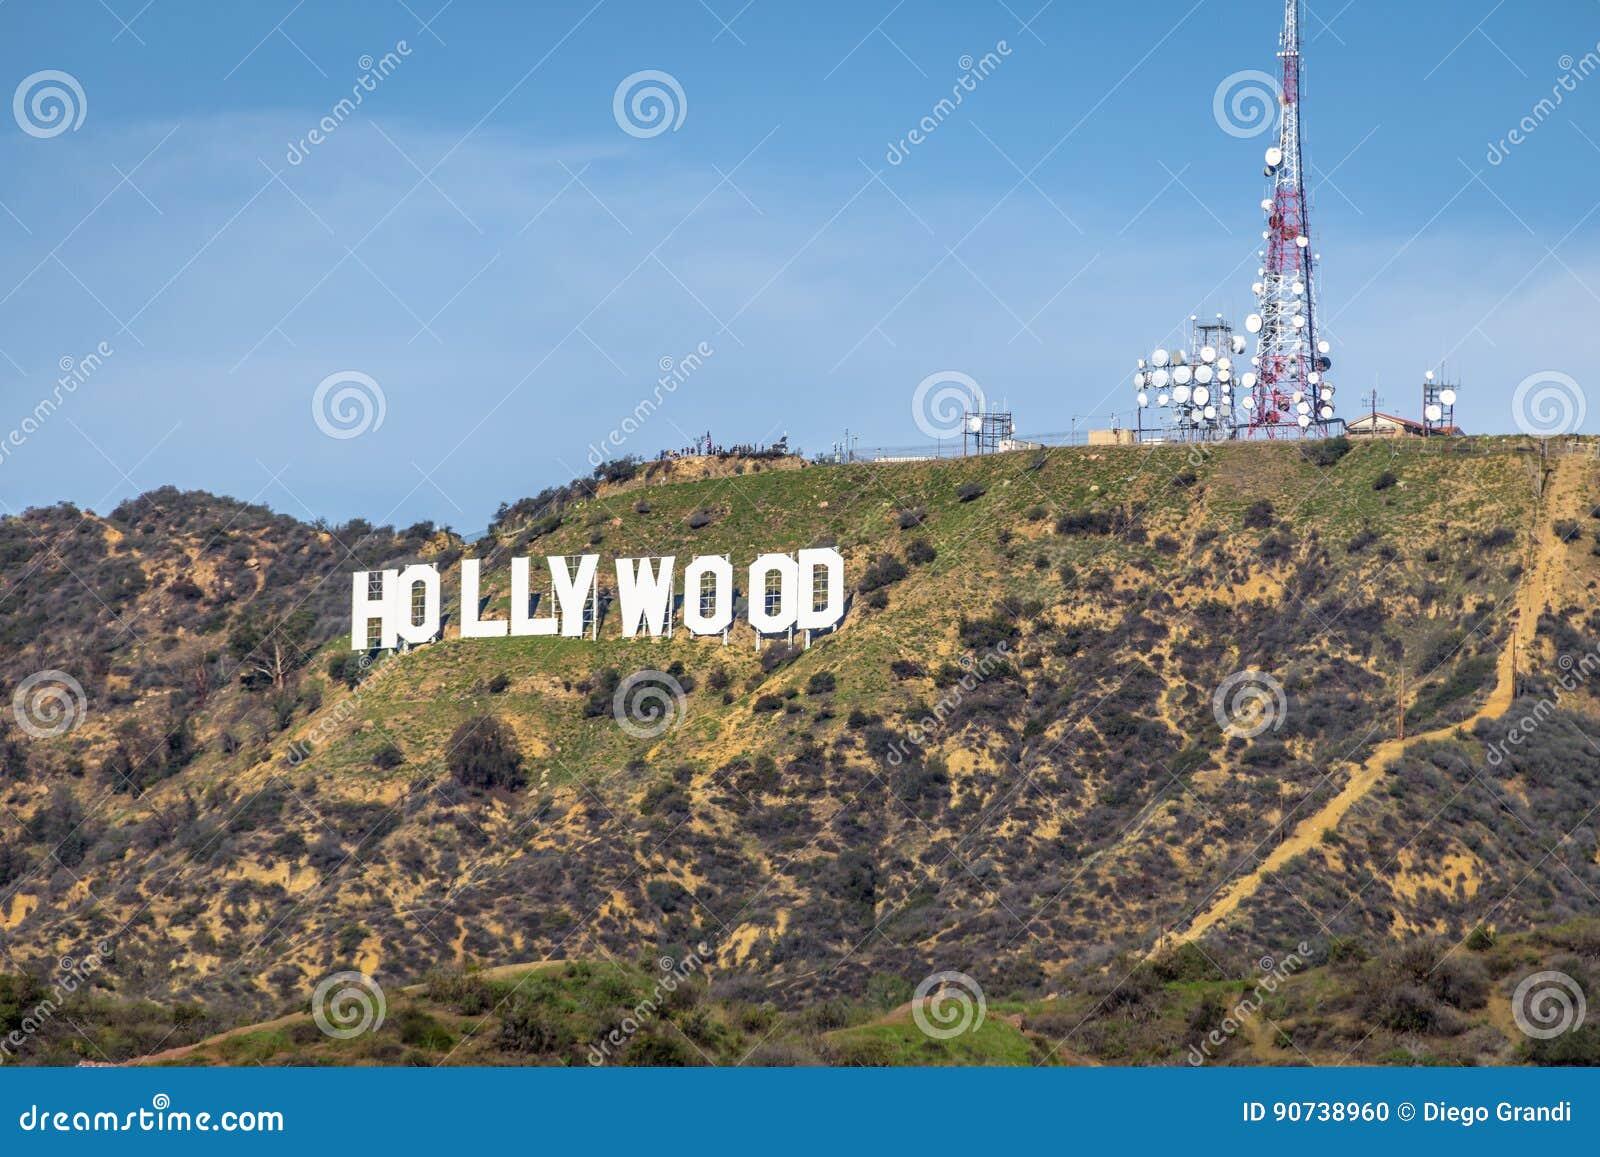 Hollywood-Schriftzug - Los Angeles, Kalifornien, USA